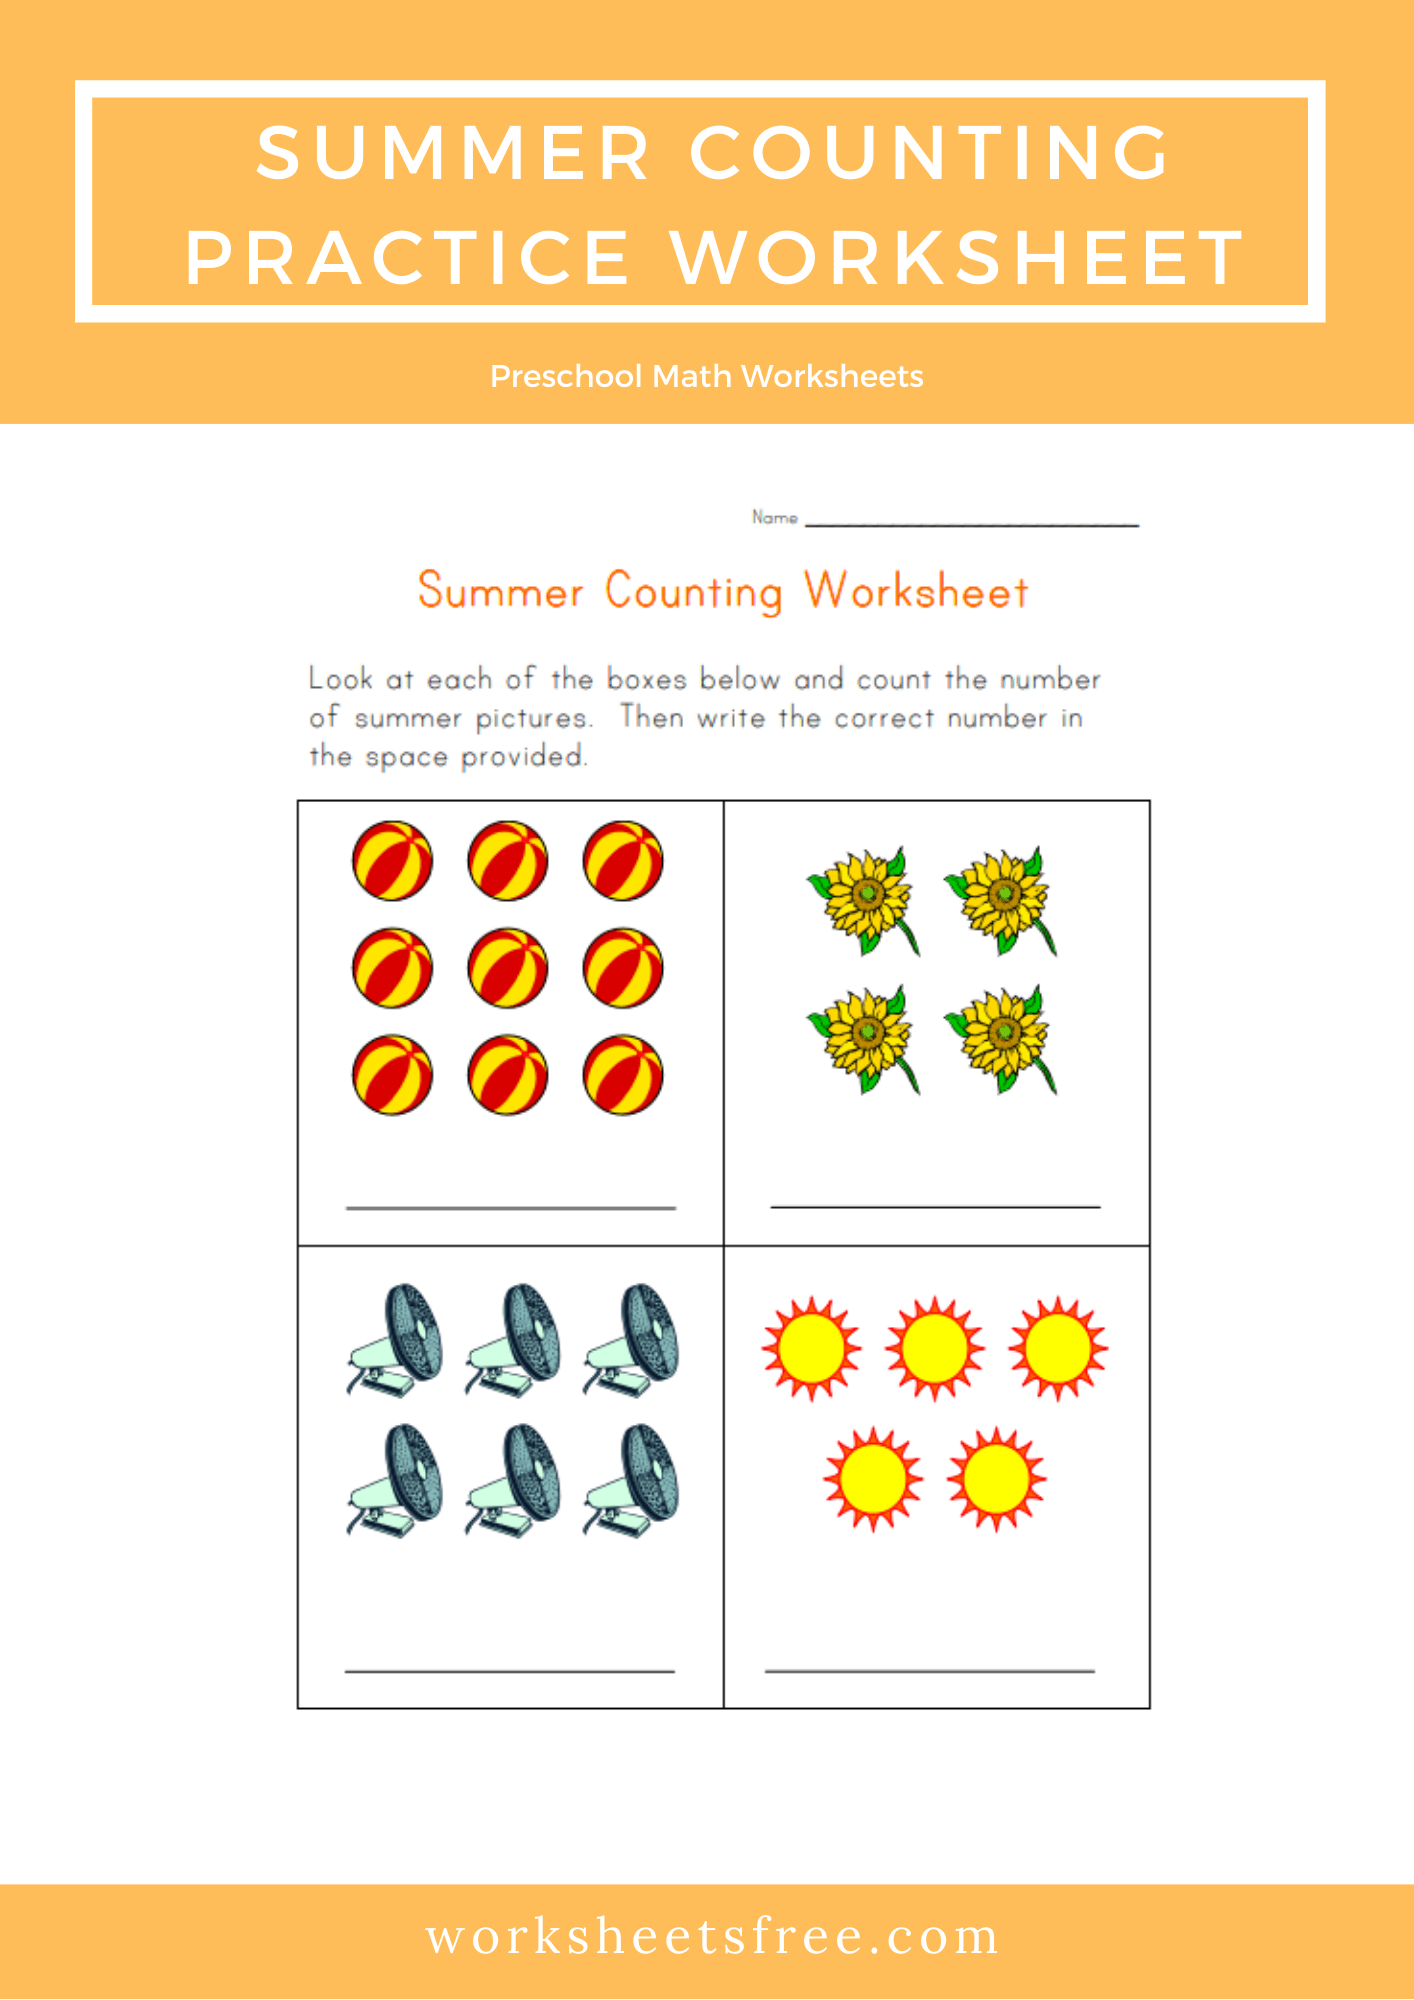 Summer Counting Practice Worksheet